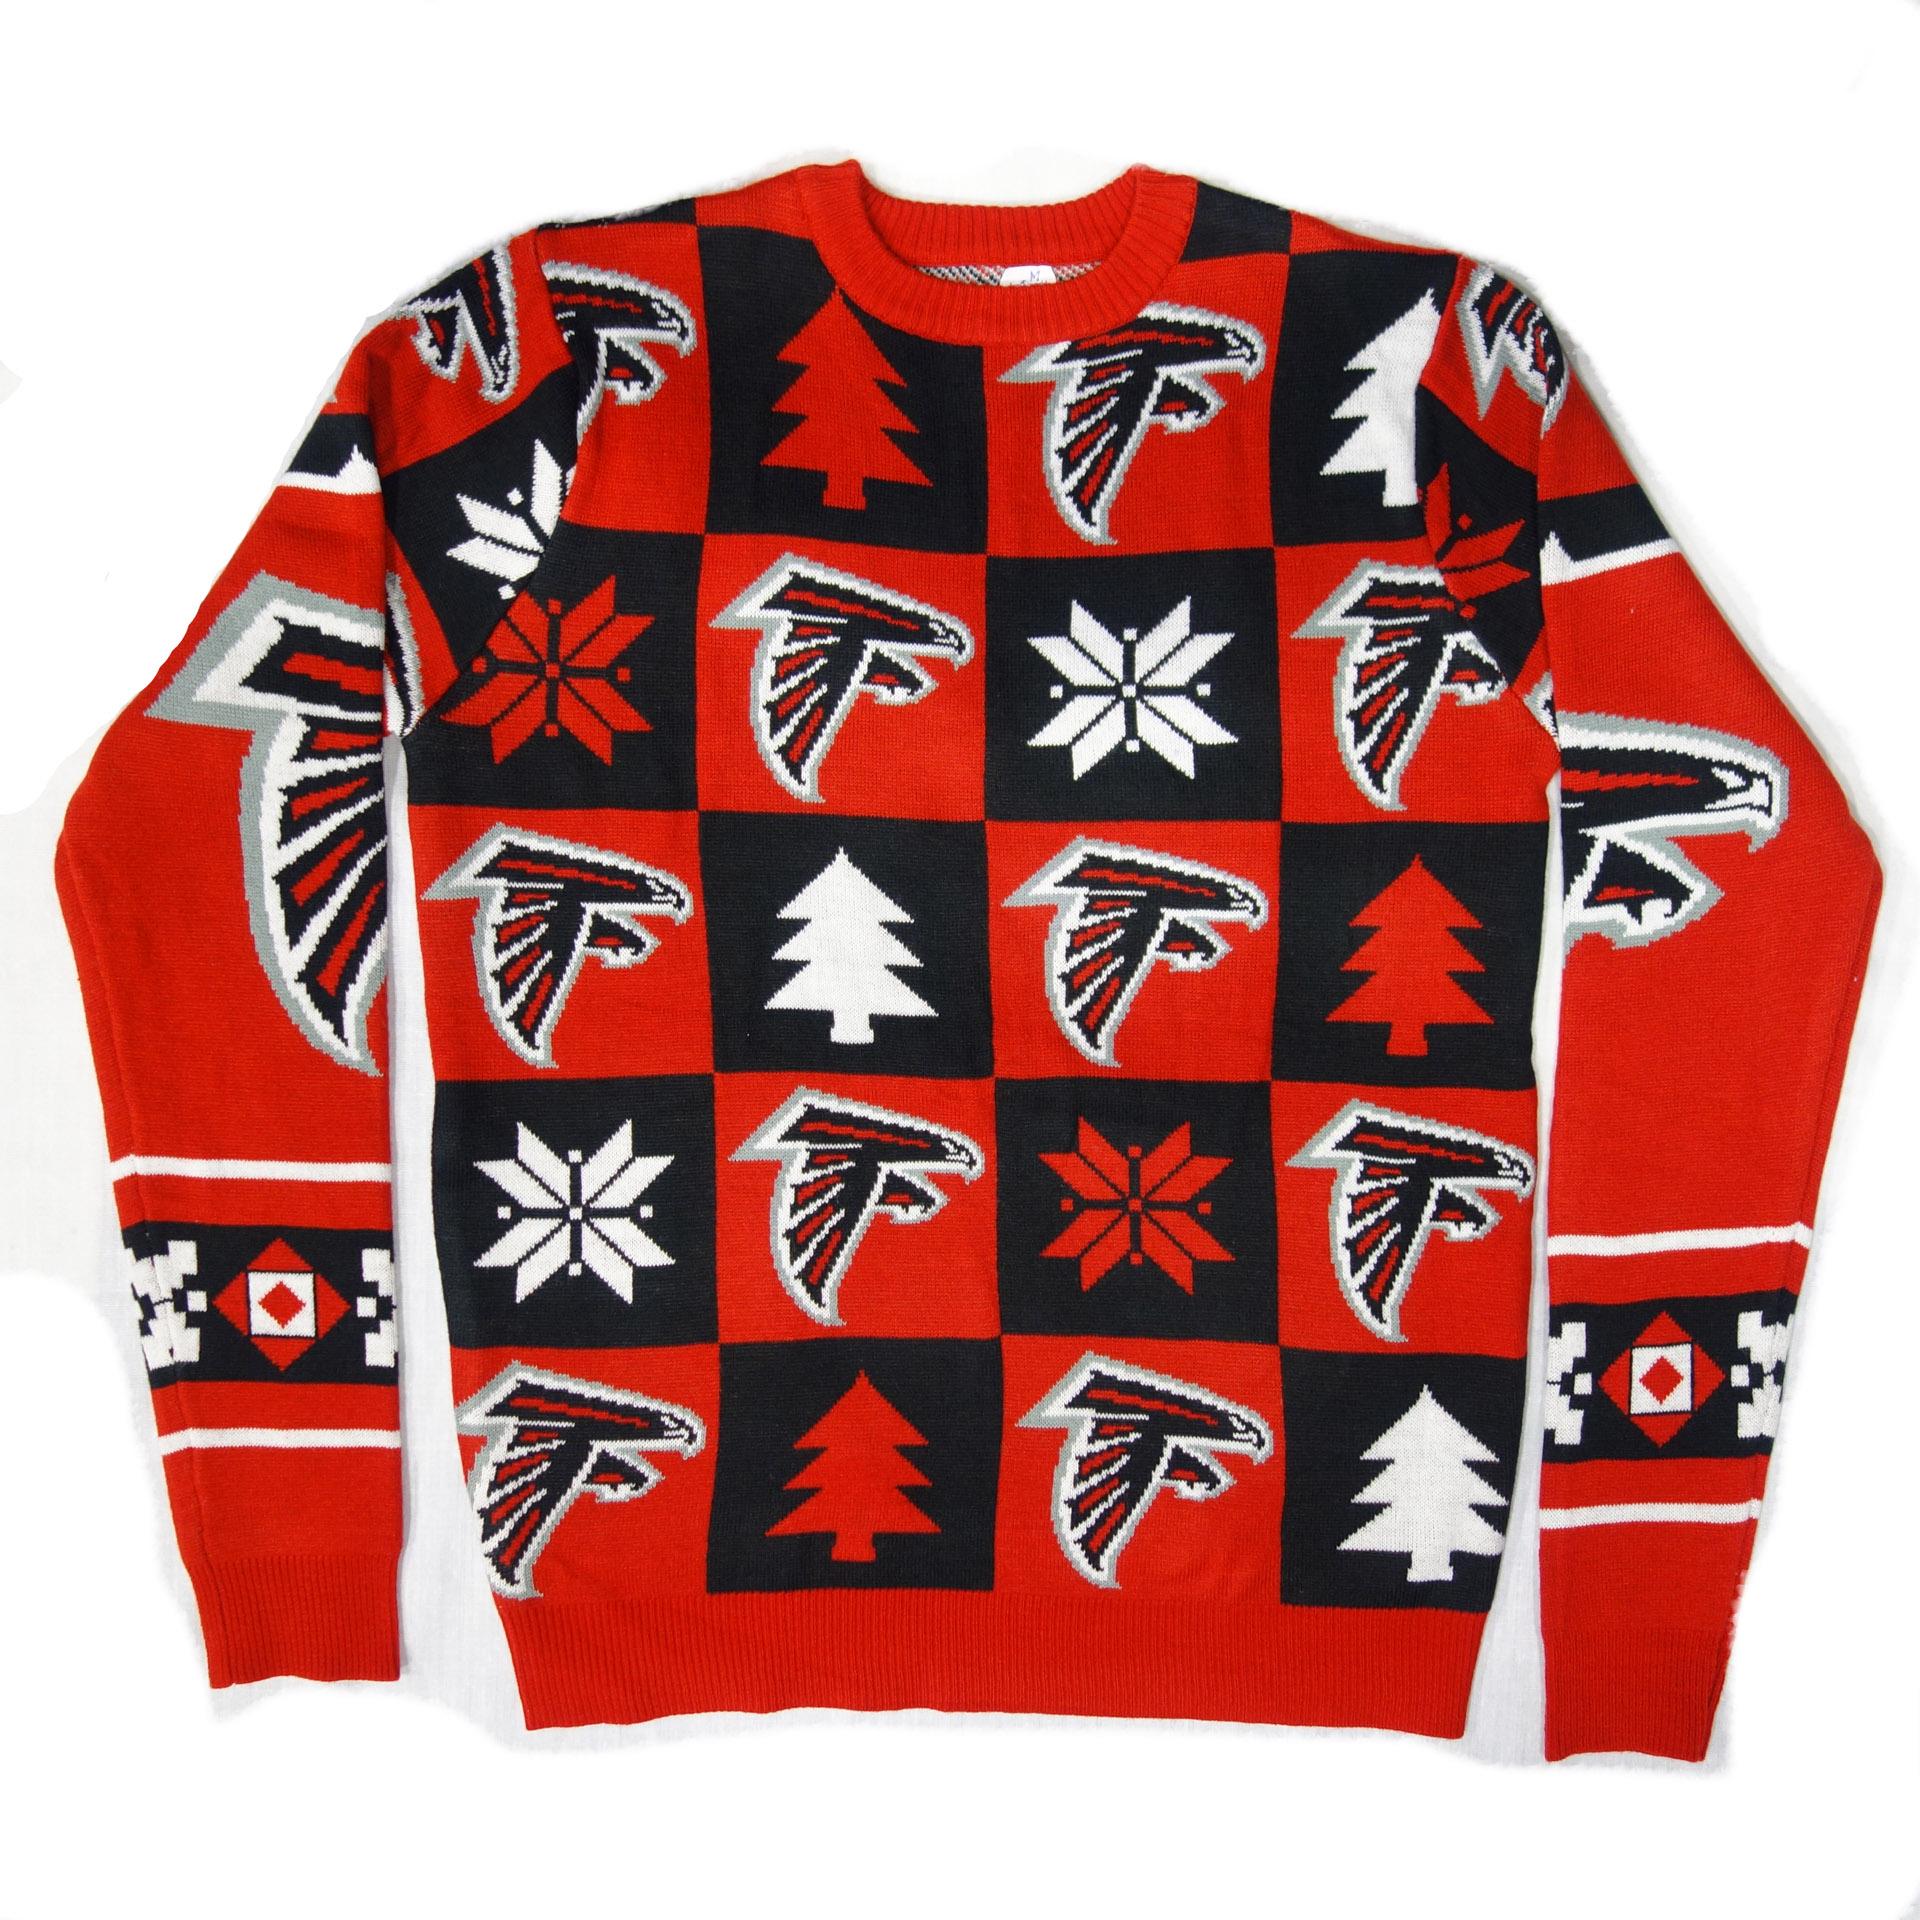 NFL Ugly Sweater Atlanta Falcons Schachbrettmuster Weihnachtspullover